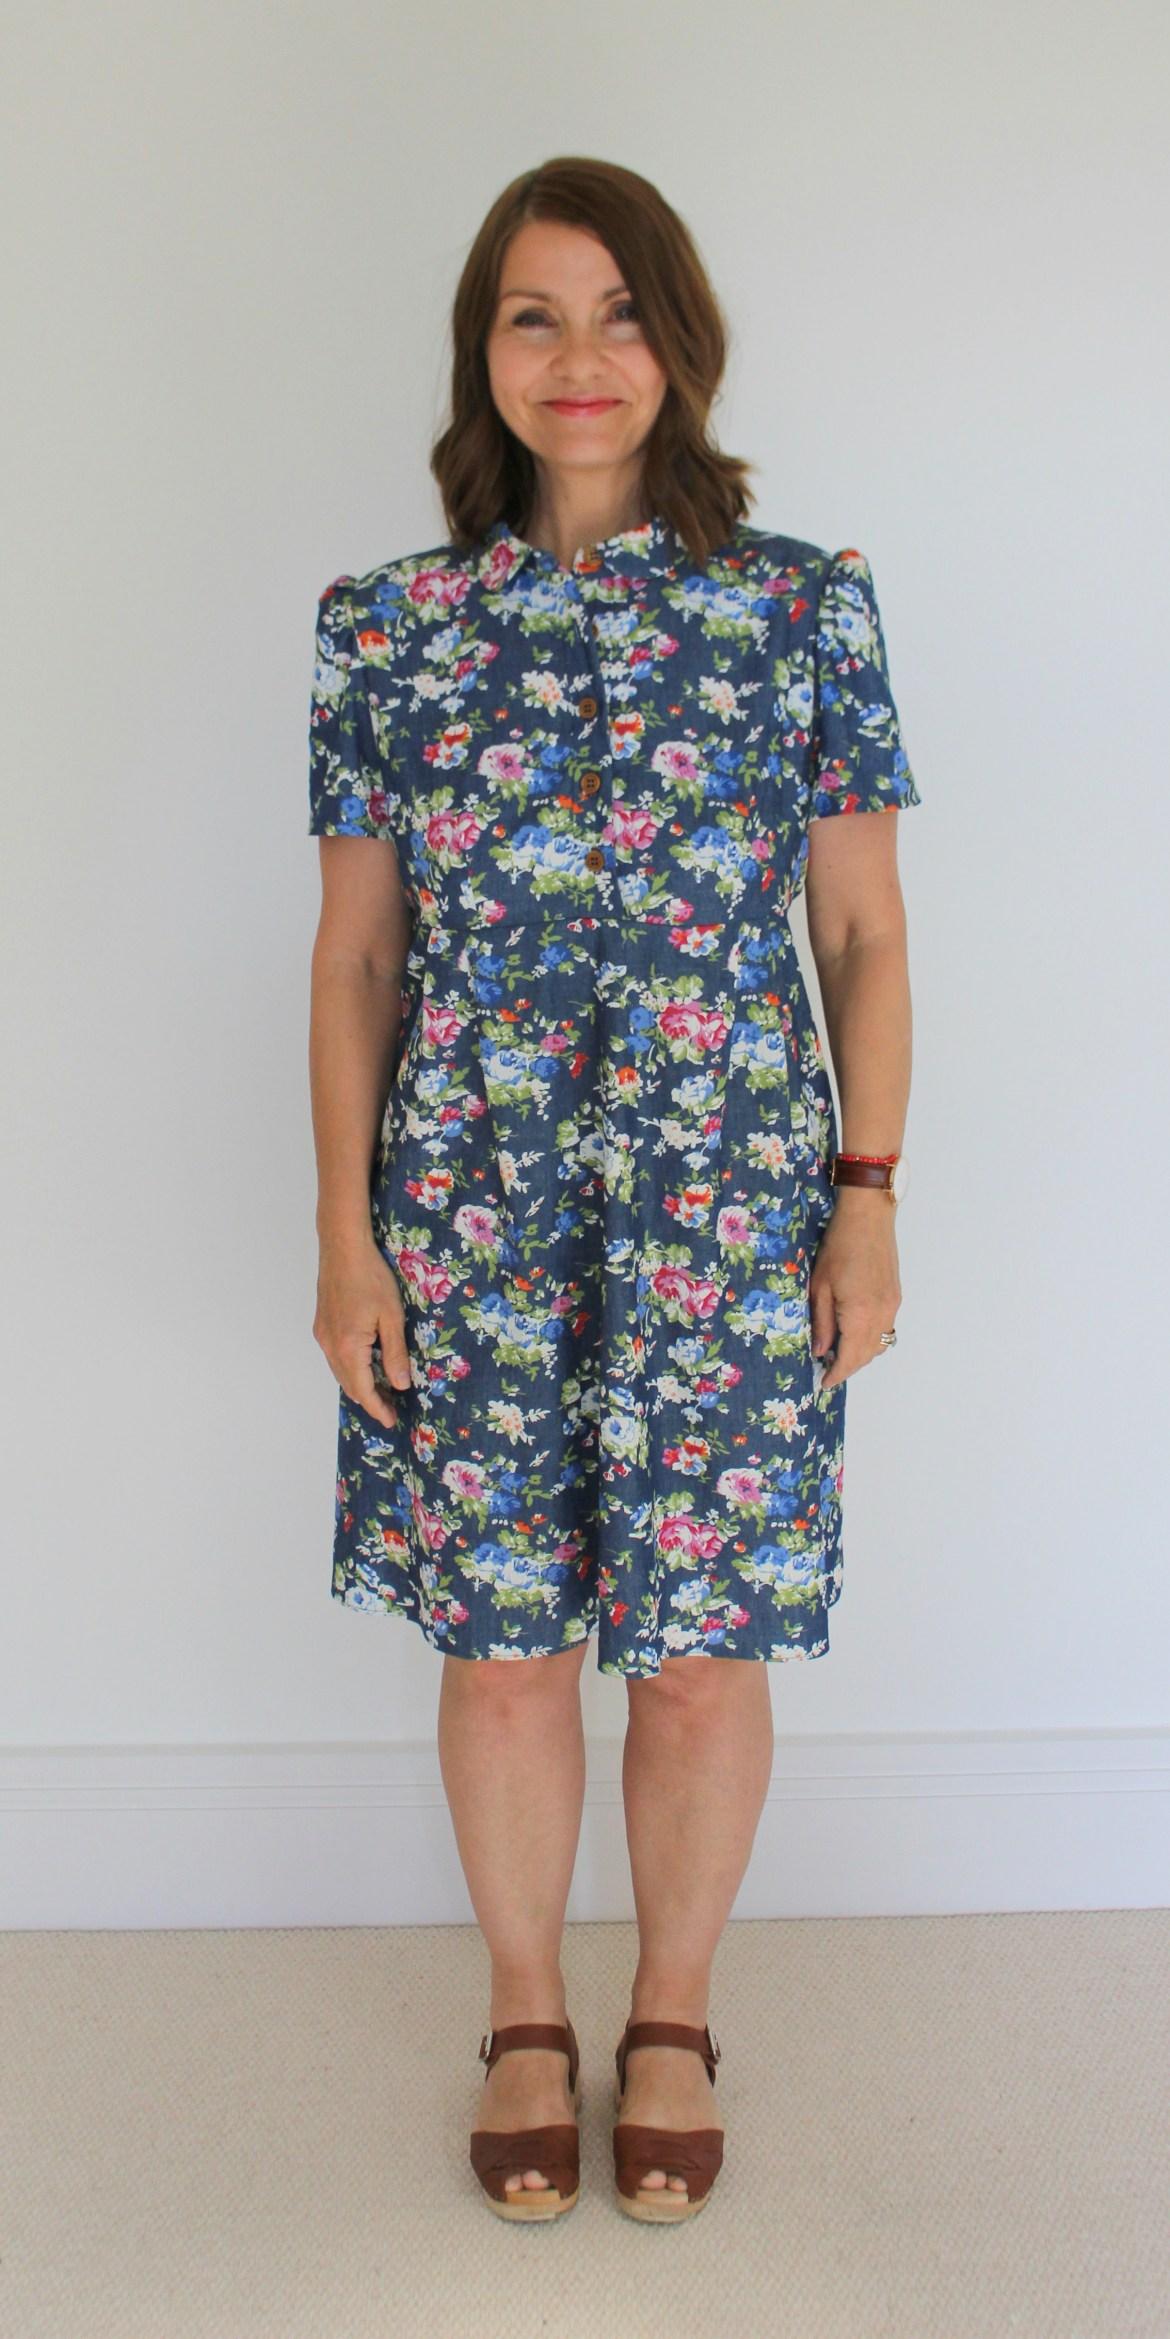 shirtdress2